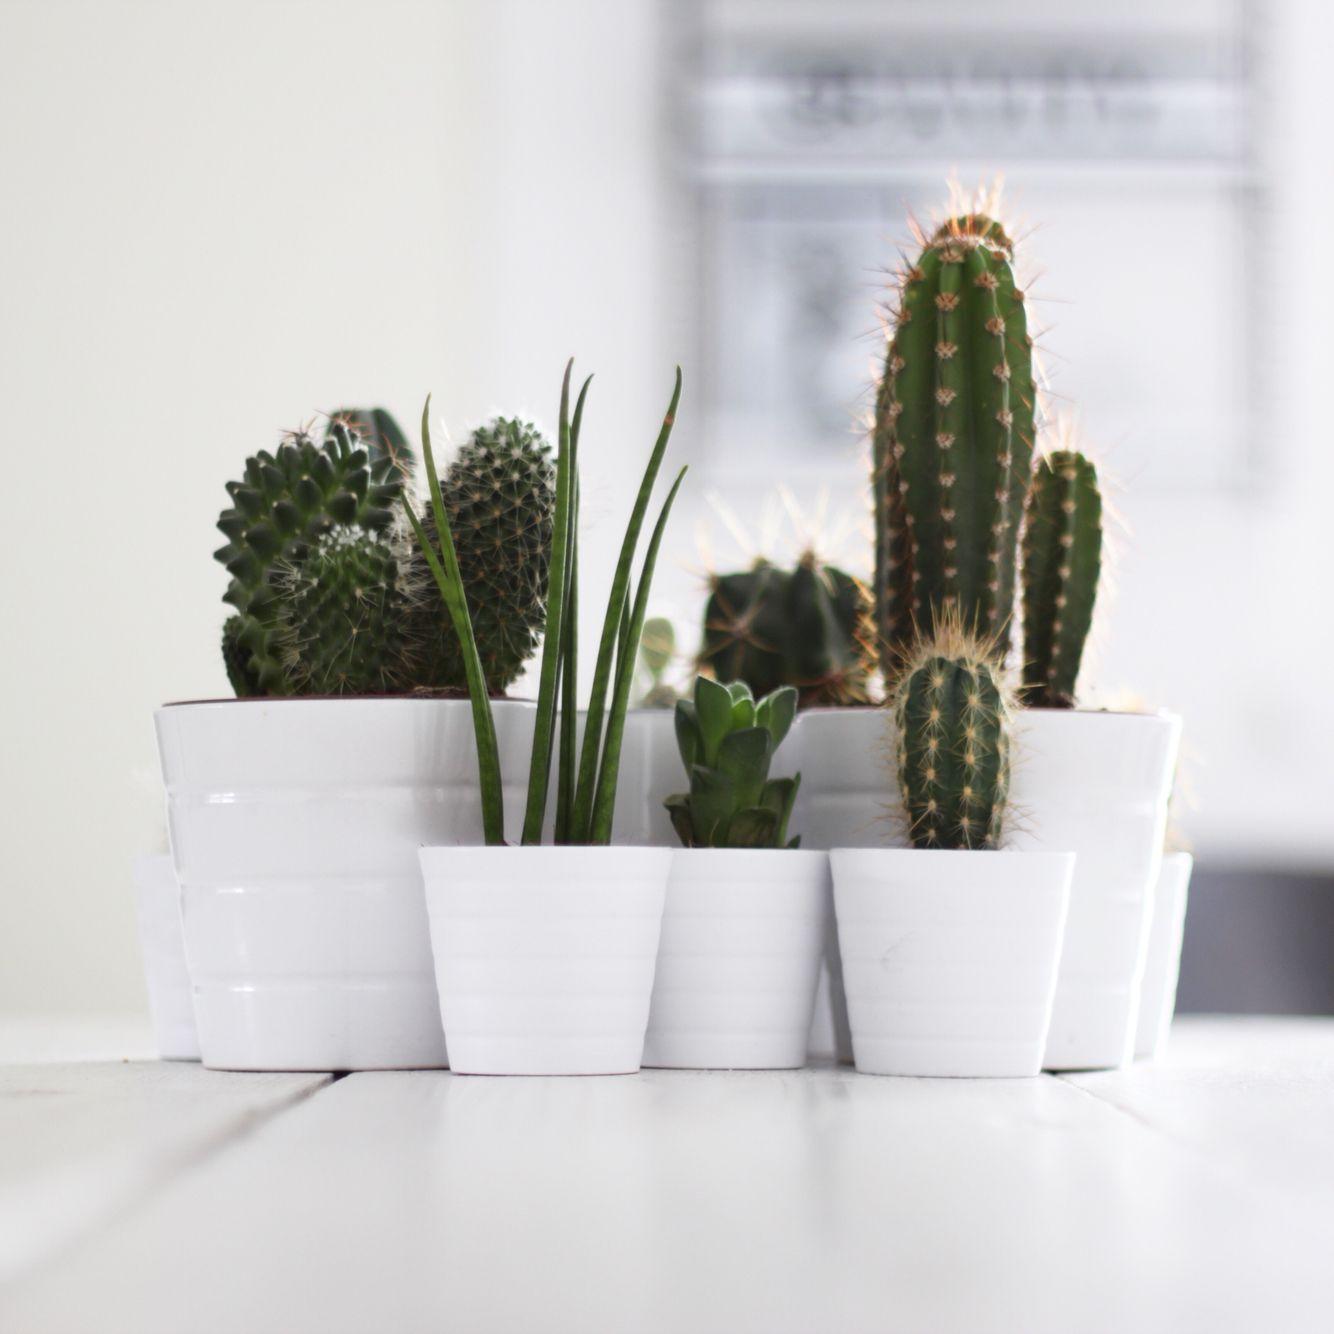 Cactus Ikea Myhome Ikea Plants Cactus Plants House